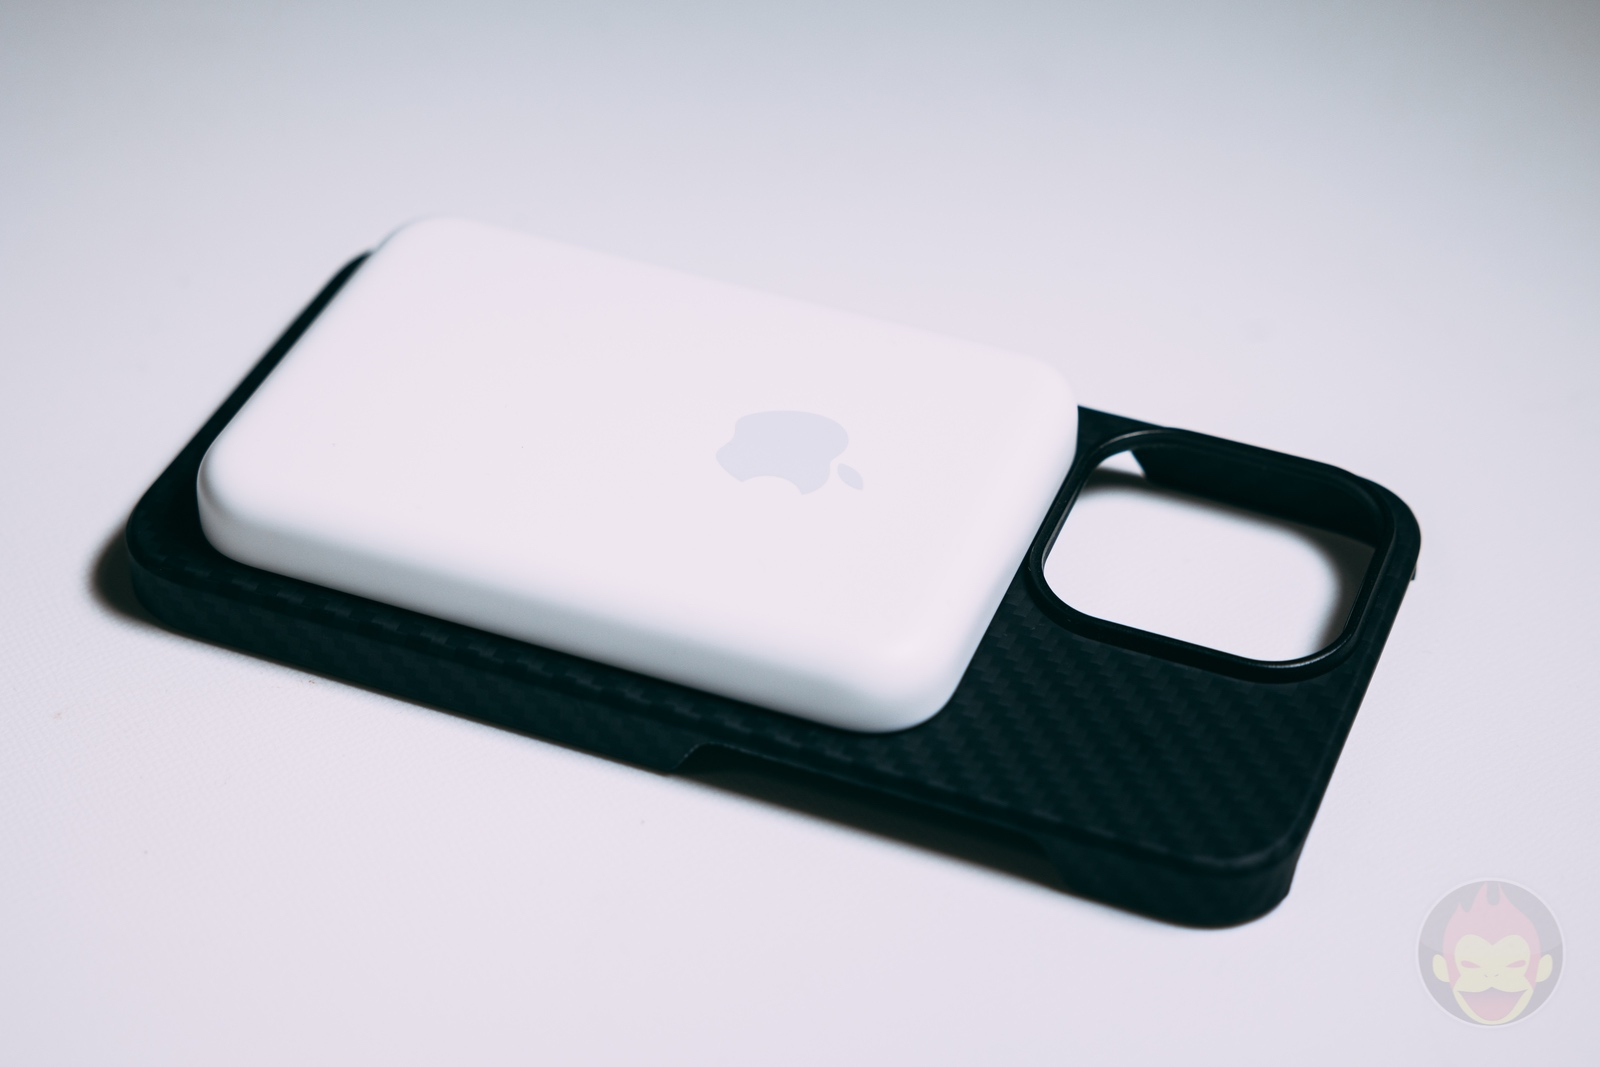 PITAKA MagSafe Compatible Case Review 06